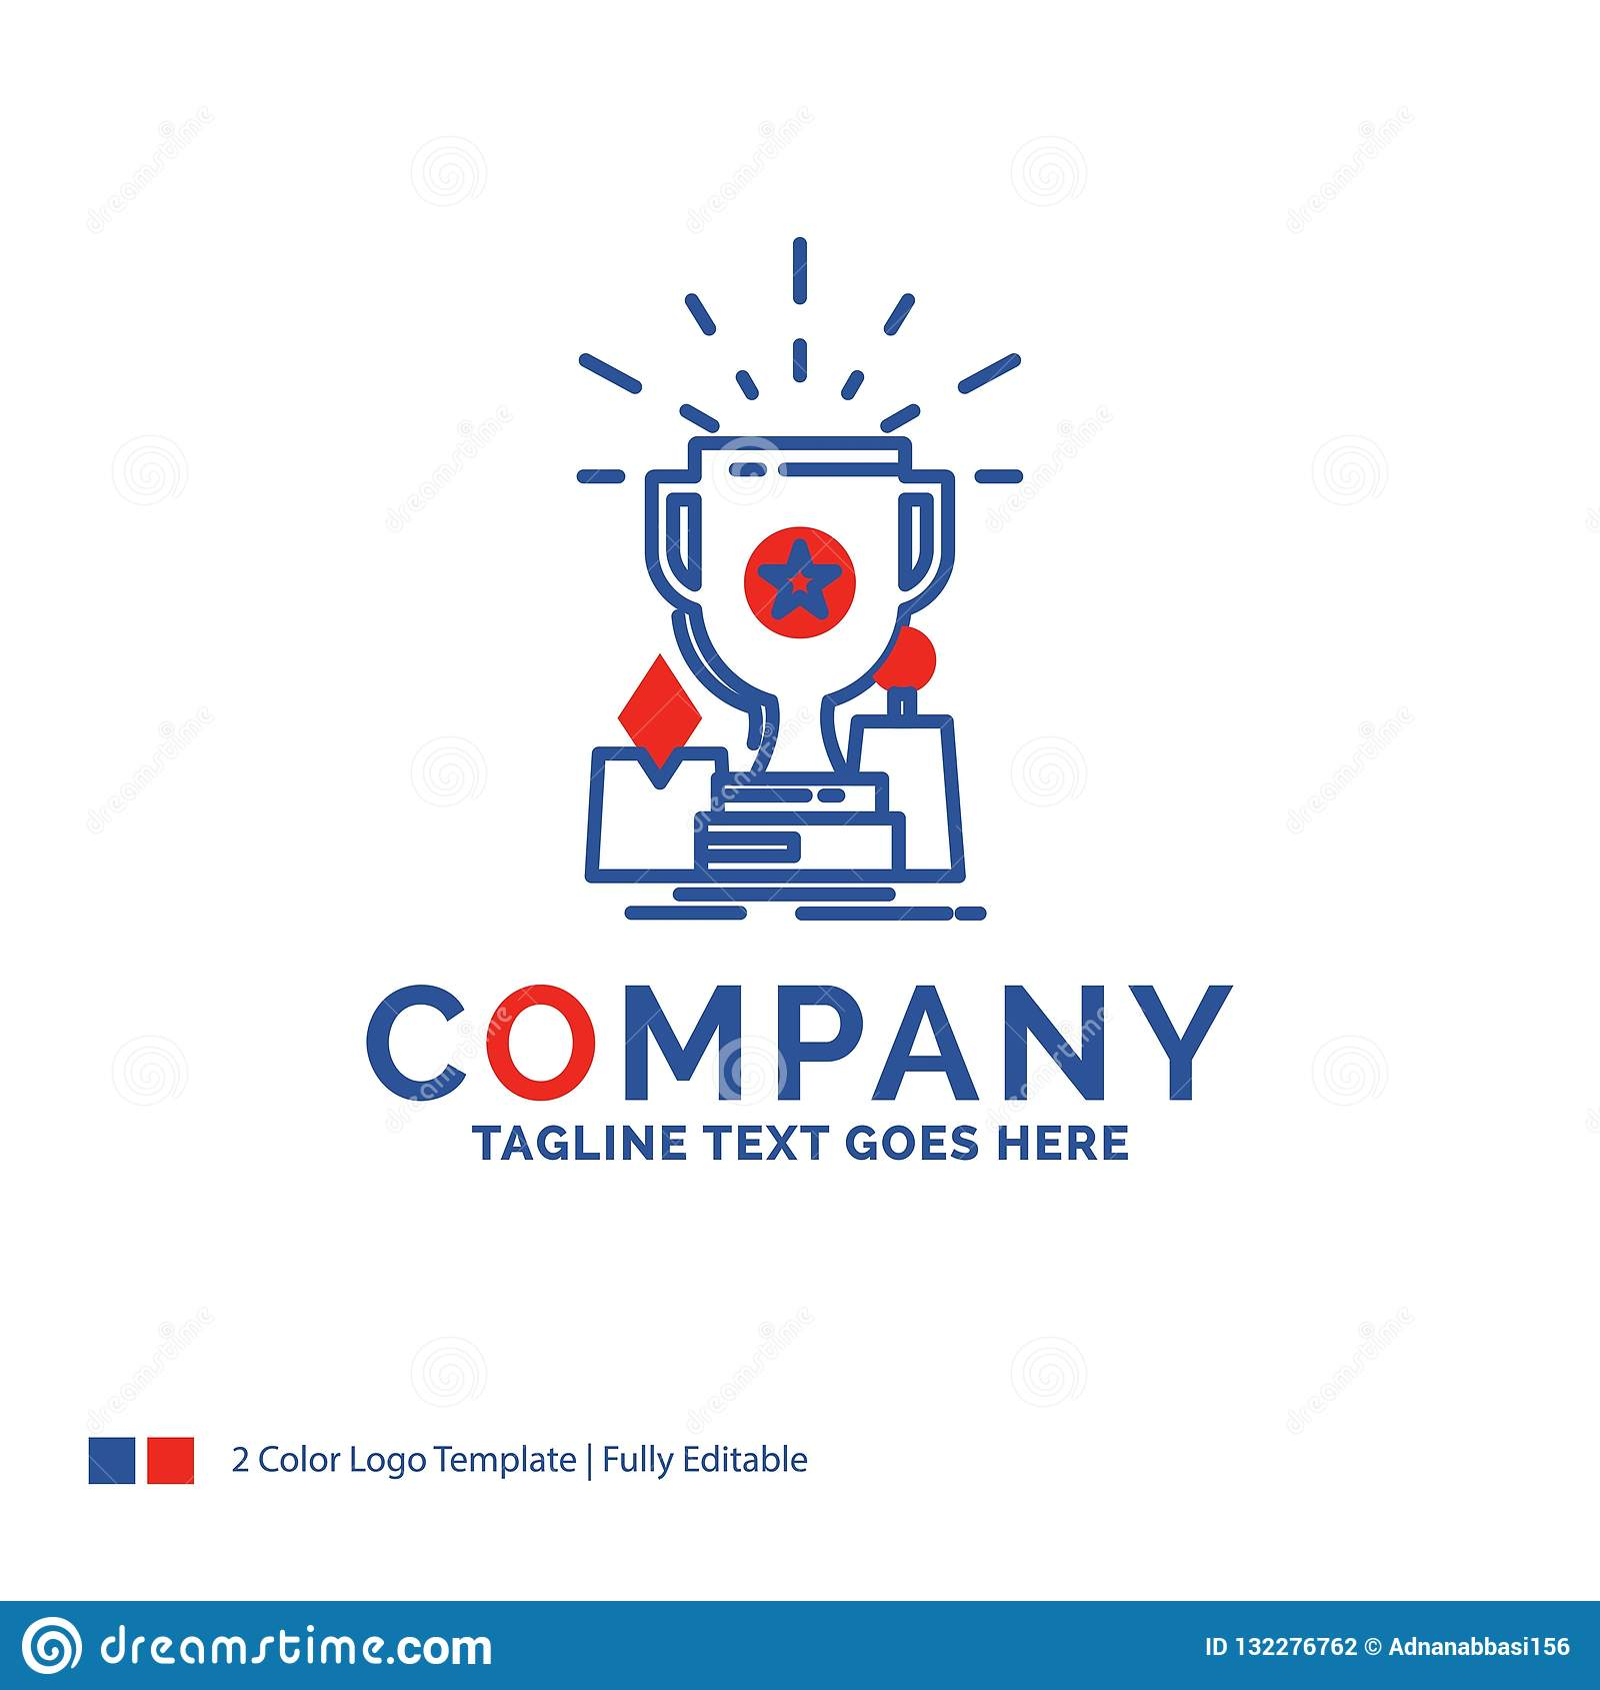 Company Name Logo Design For Achievement, Award, Cup